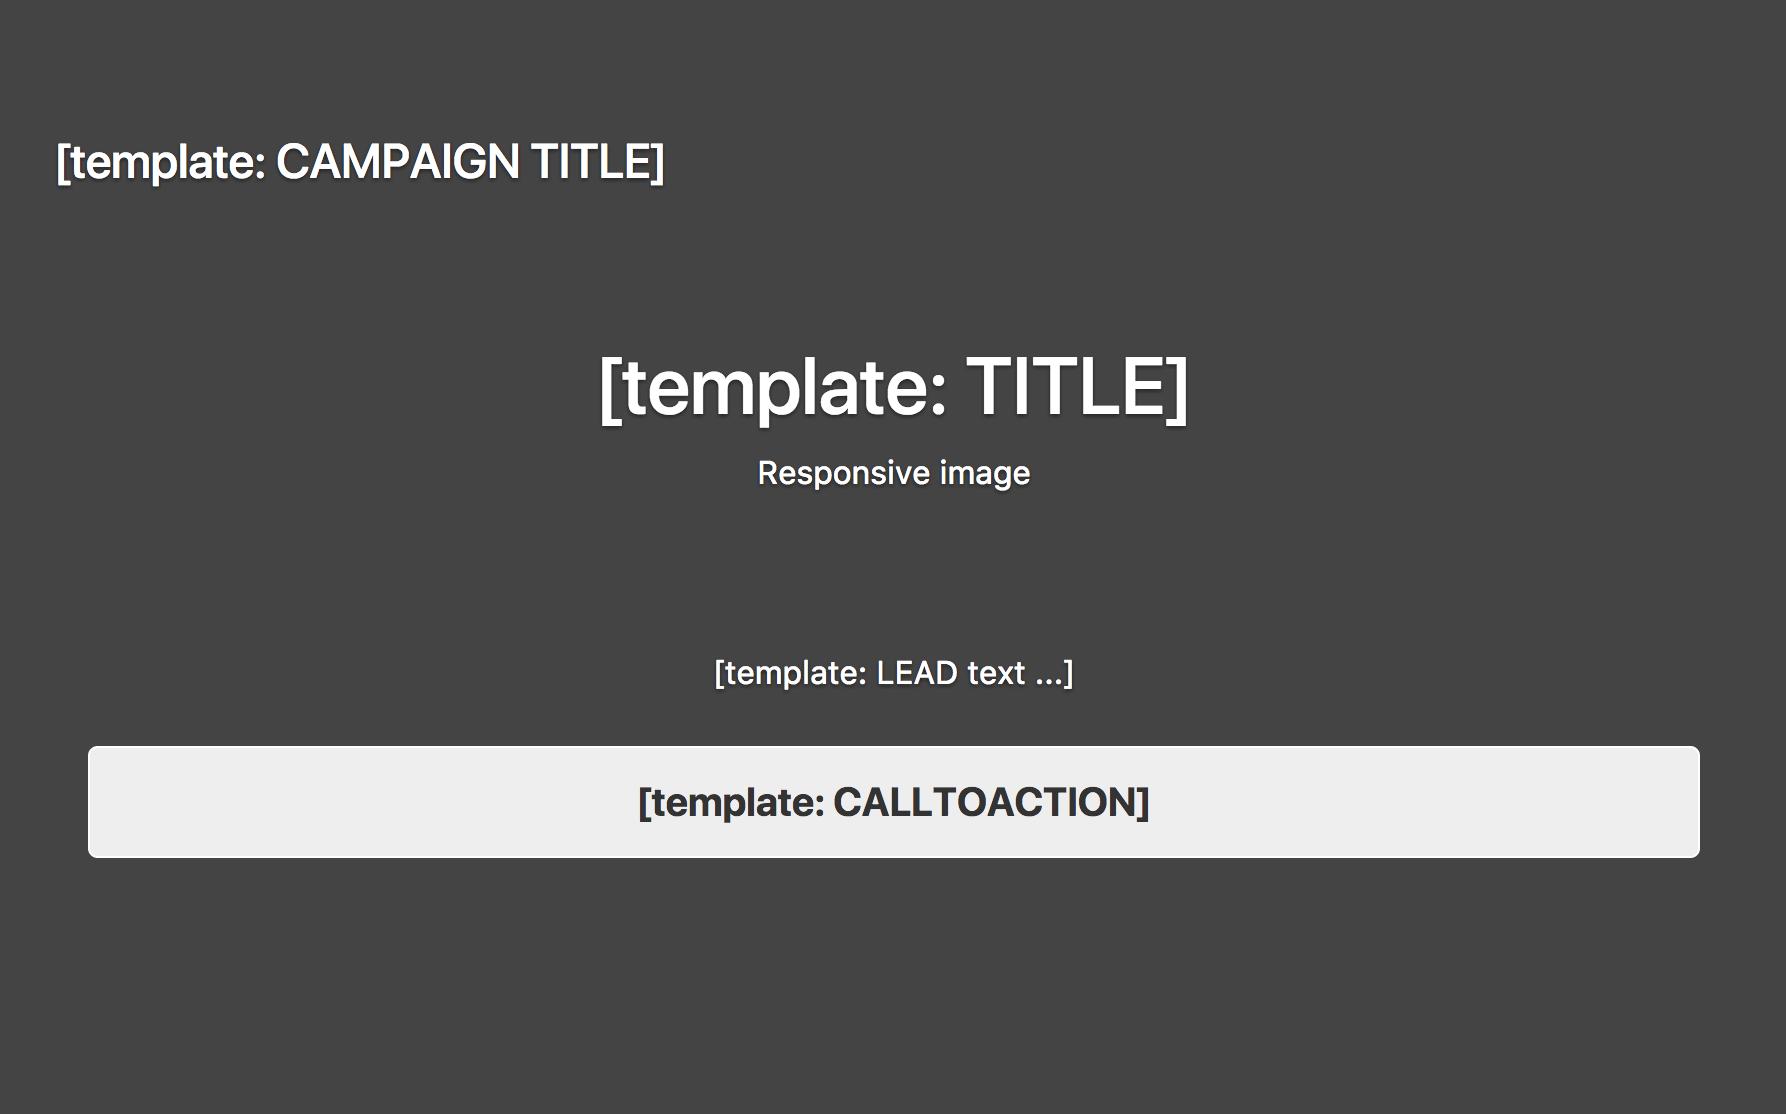 Campaign template